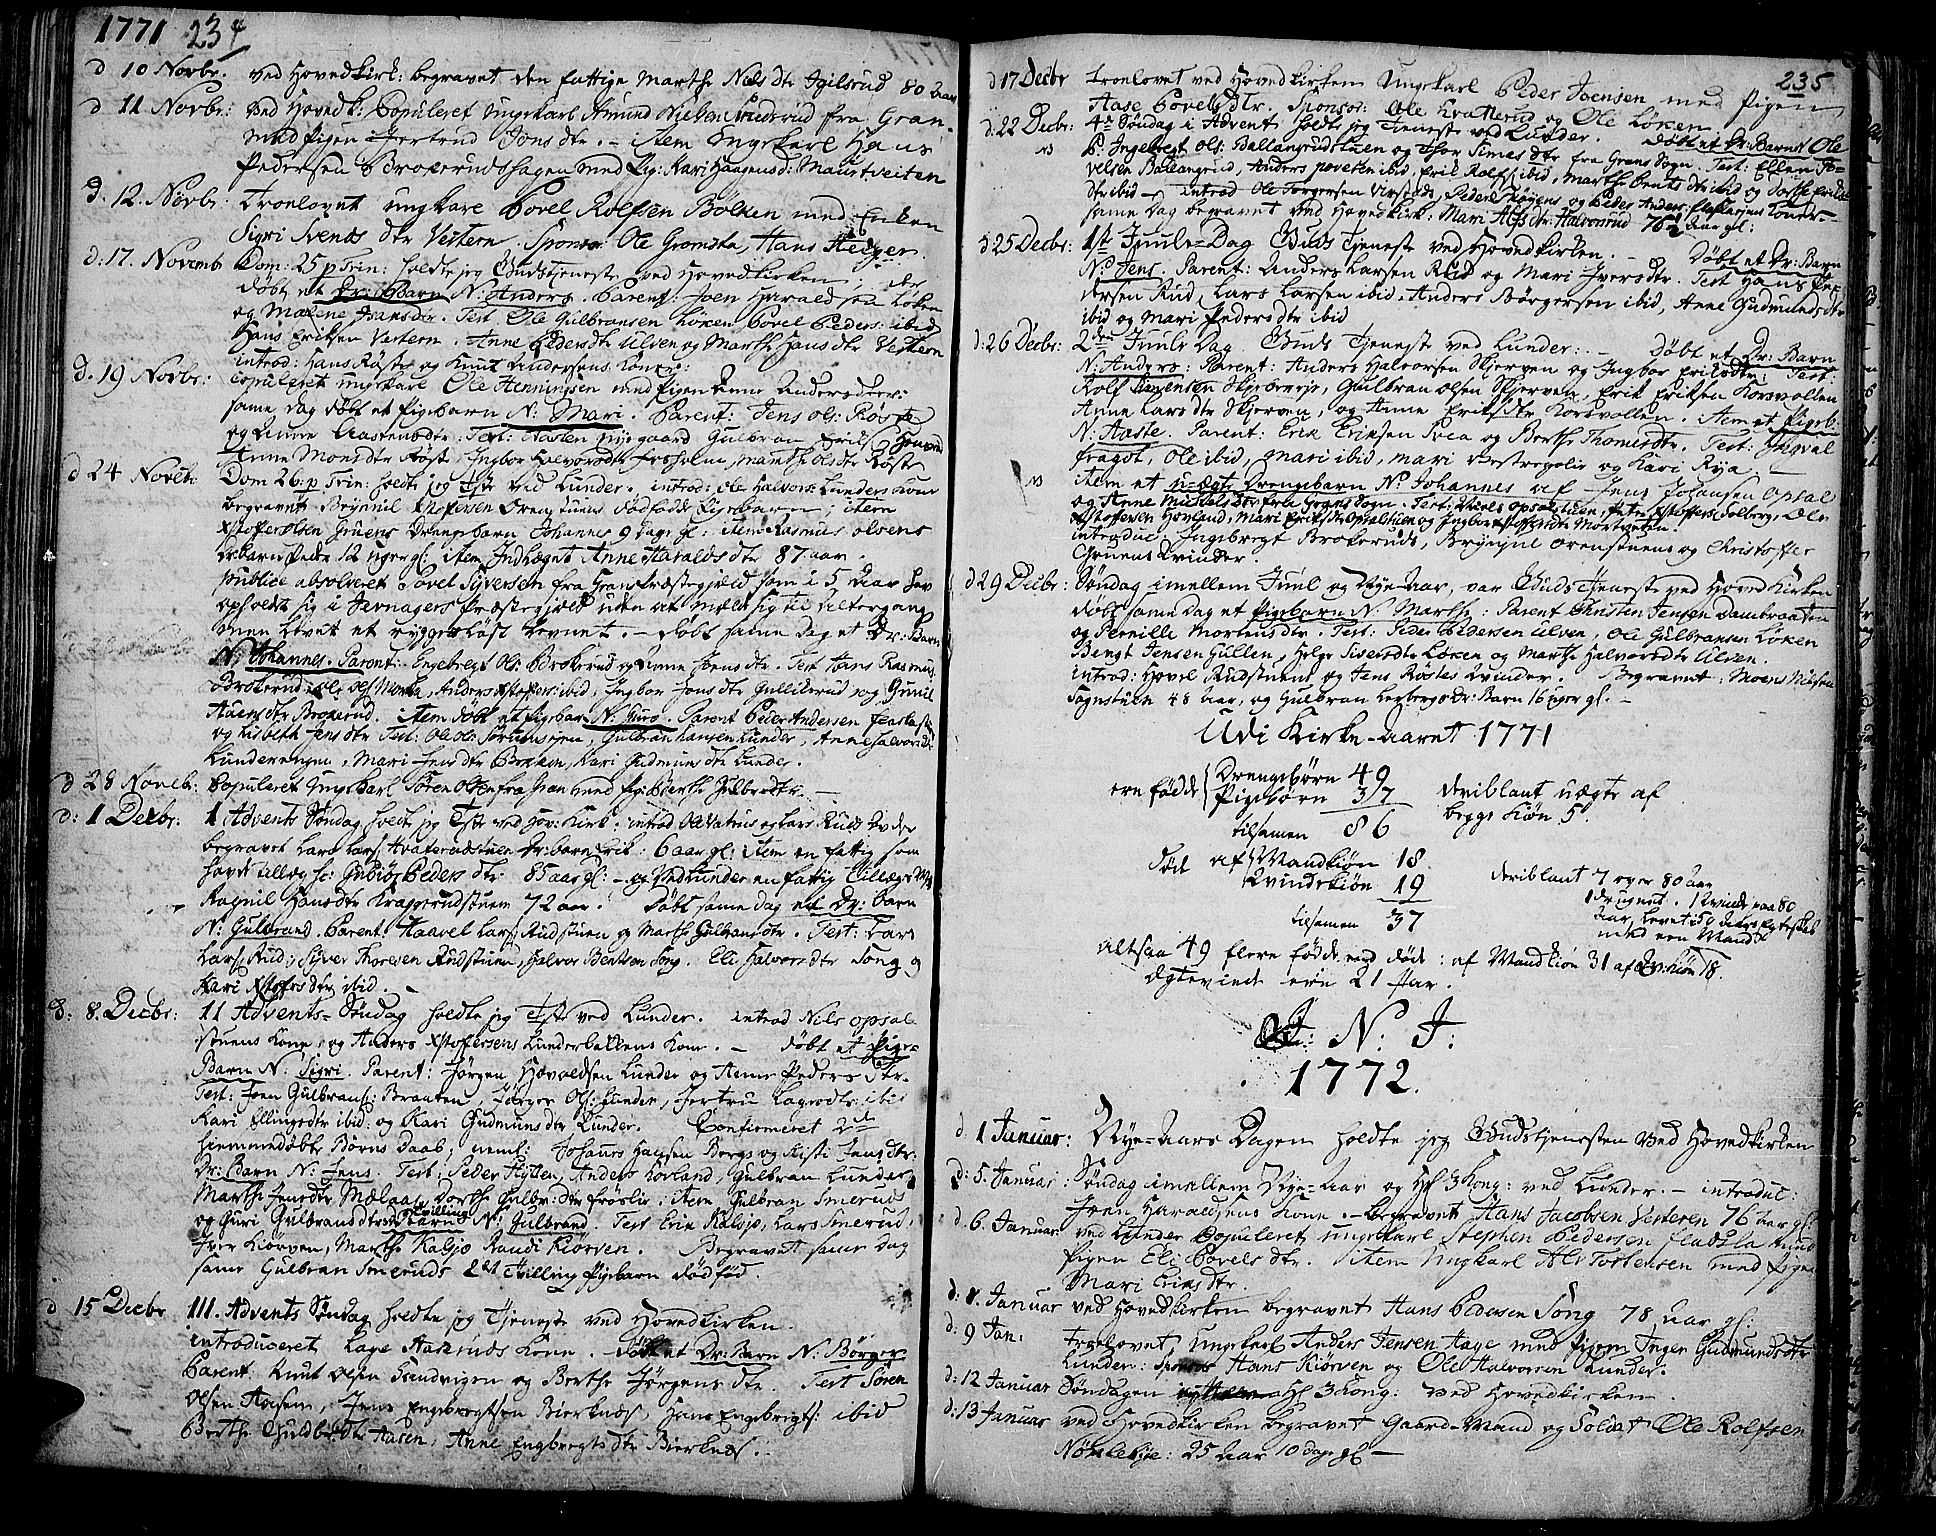 SAH, Jevnaker prestekontor, Ministerialbok nr. 3, 1752-1799, s. 234-235